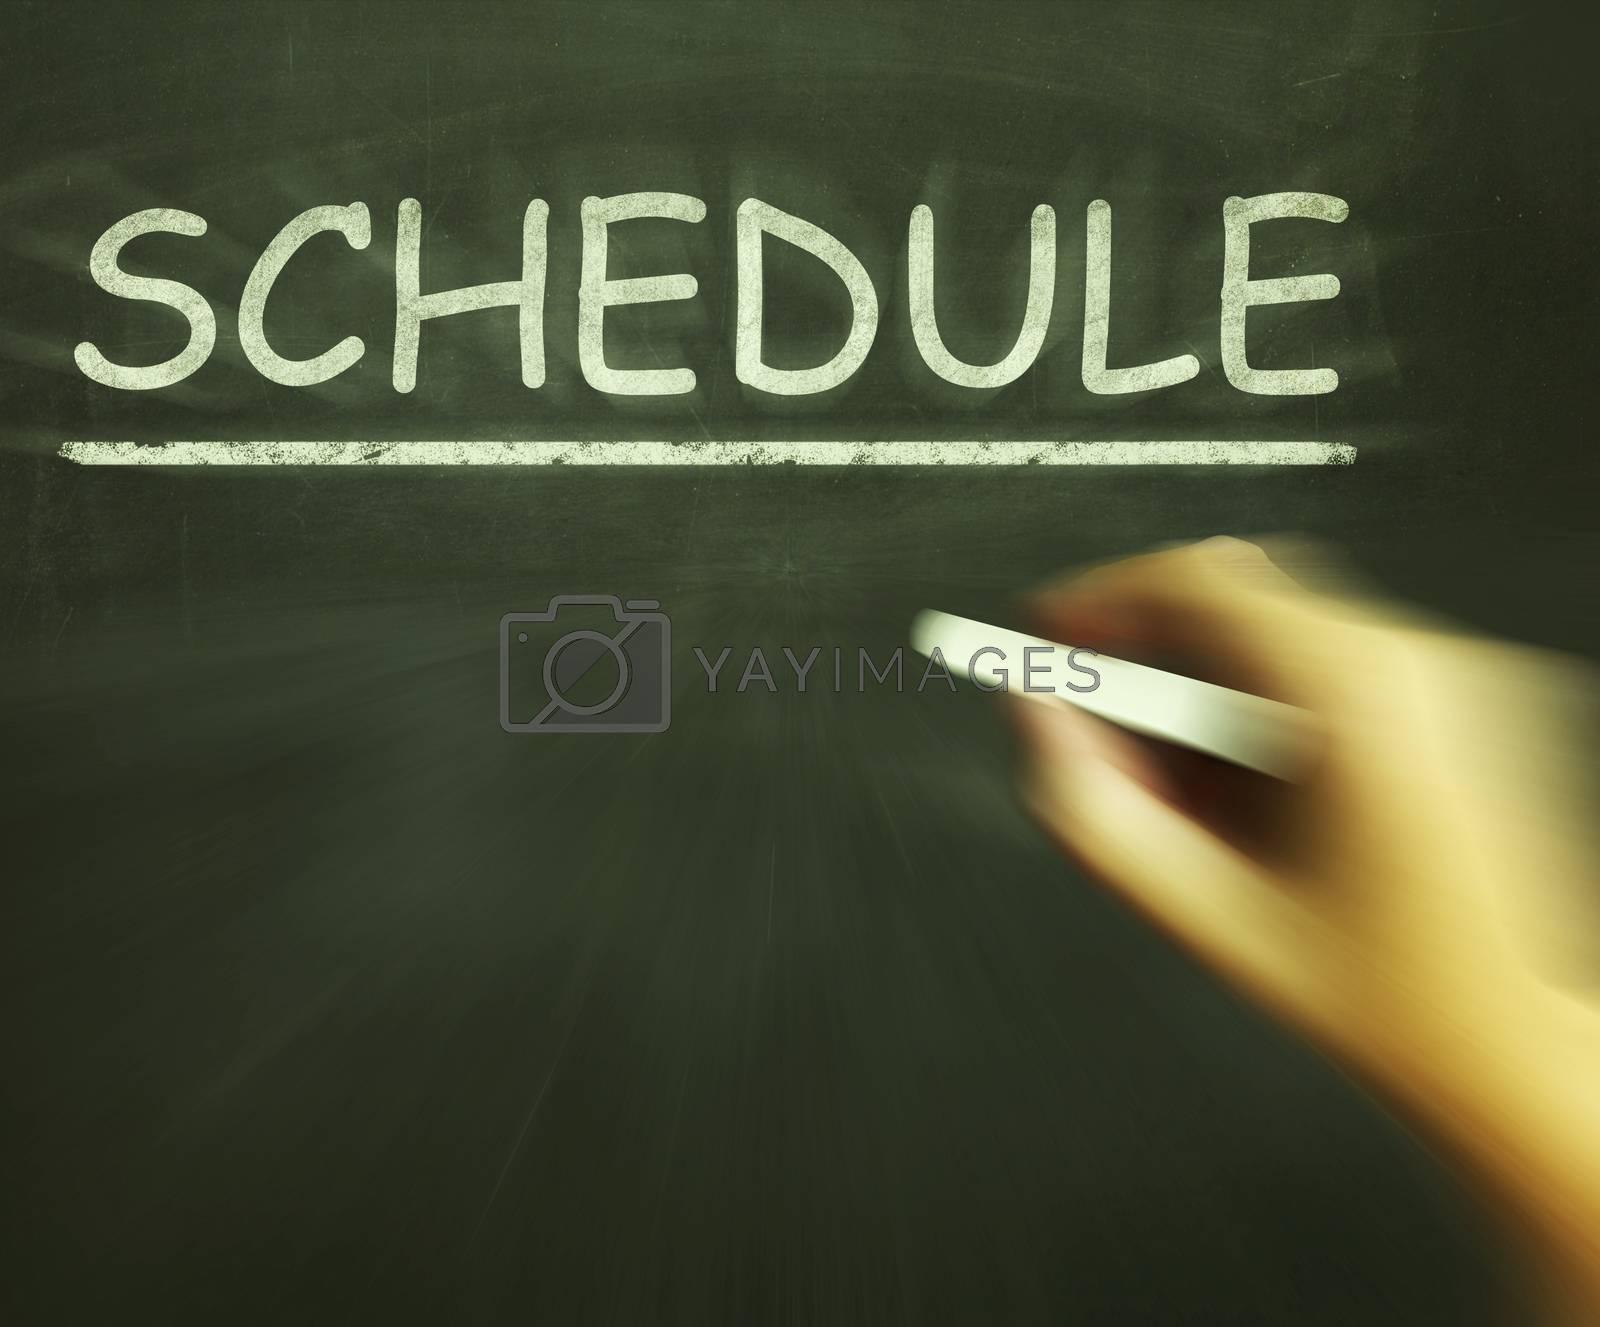 Schedule Chalk Shows Arranging Agenda And Calendar by stuartmiles